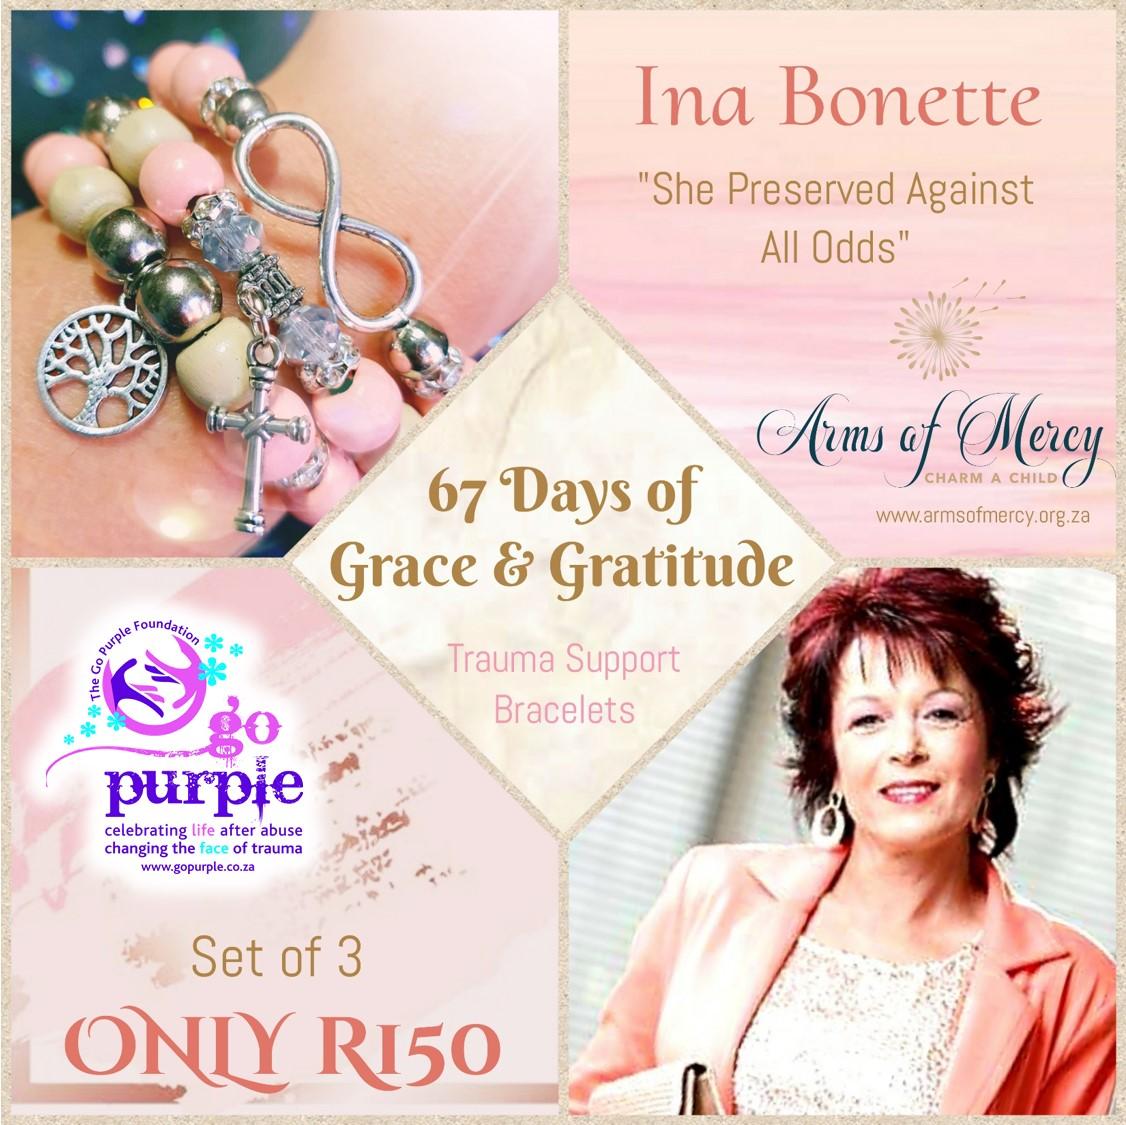 67 Days for Ina Bonette - Bracelets © Arms of Mercy NPC